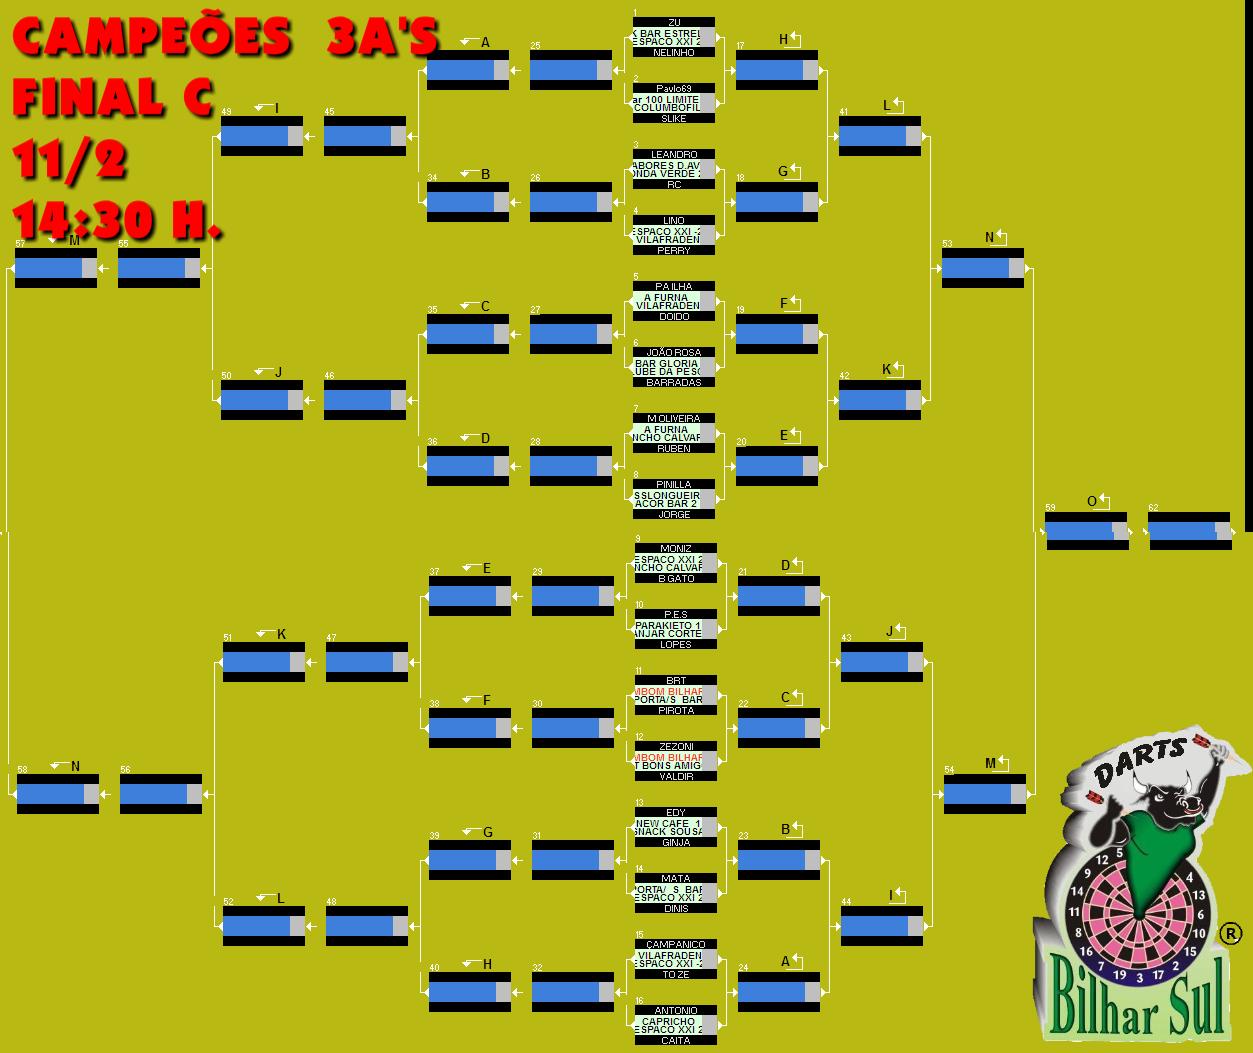 Campeões 3A's 2016 Final C